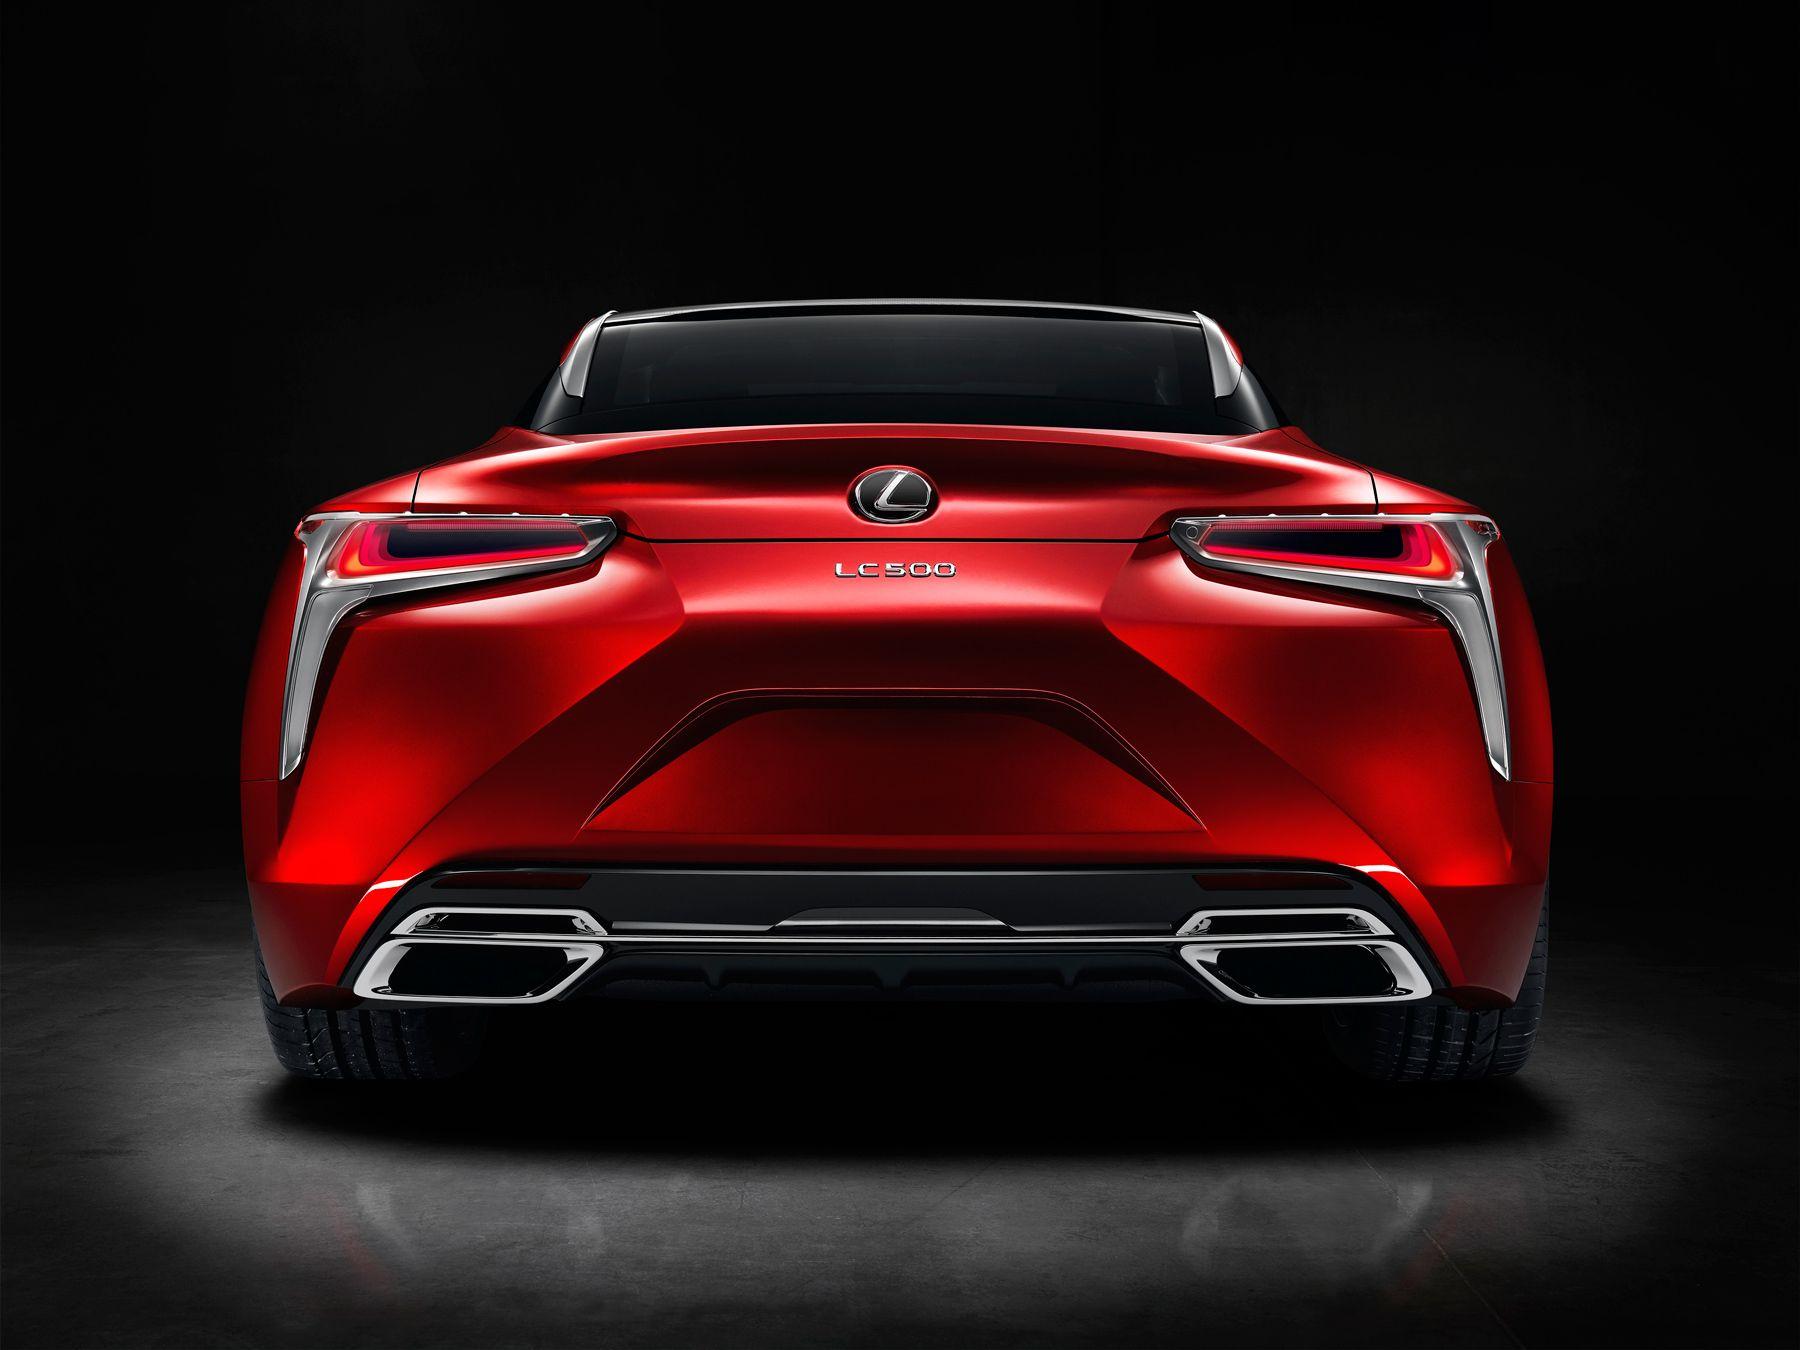 Lexus LC500 rear